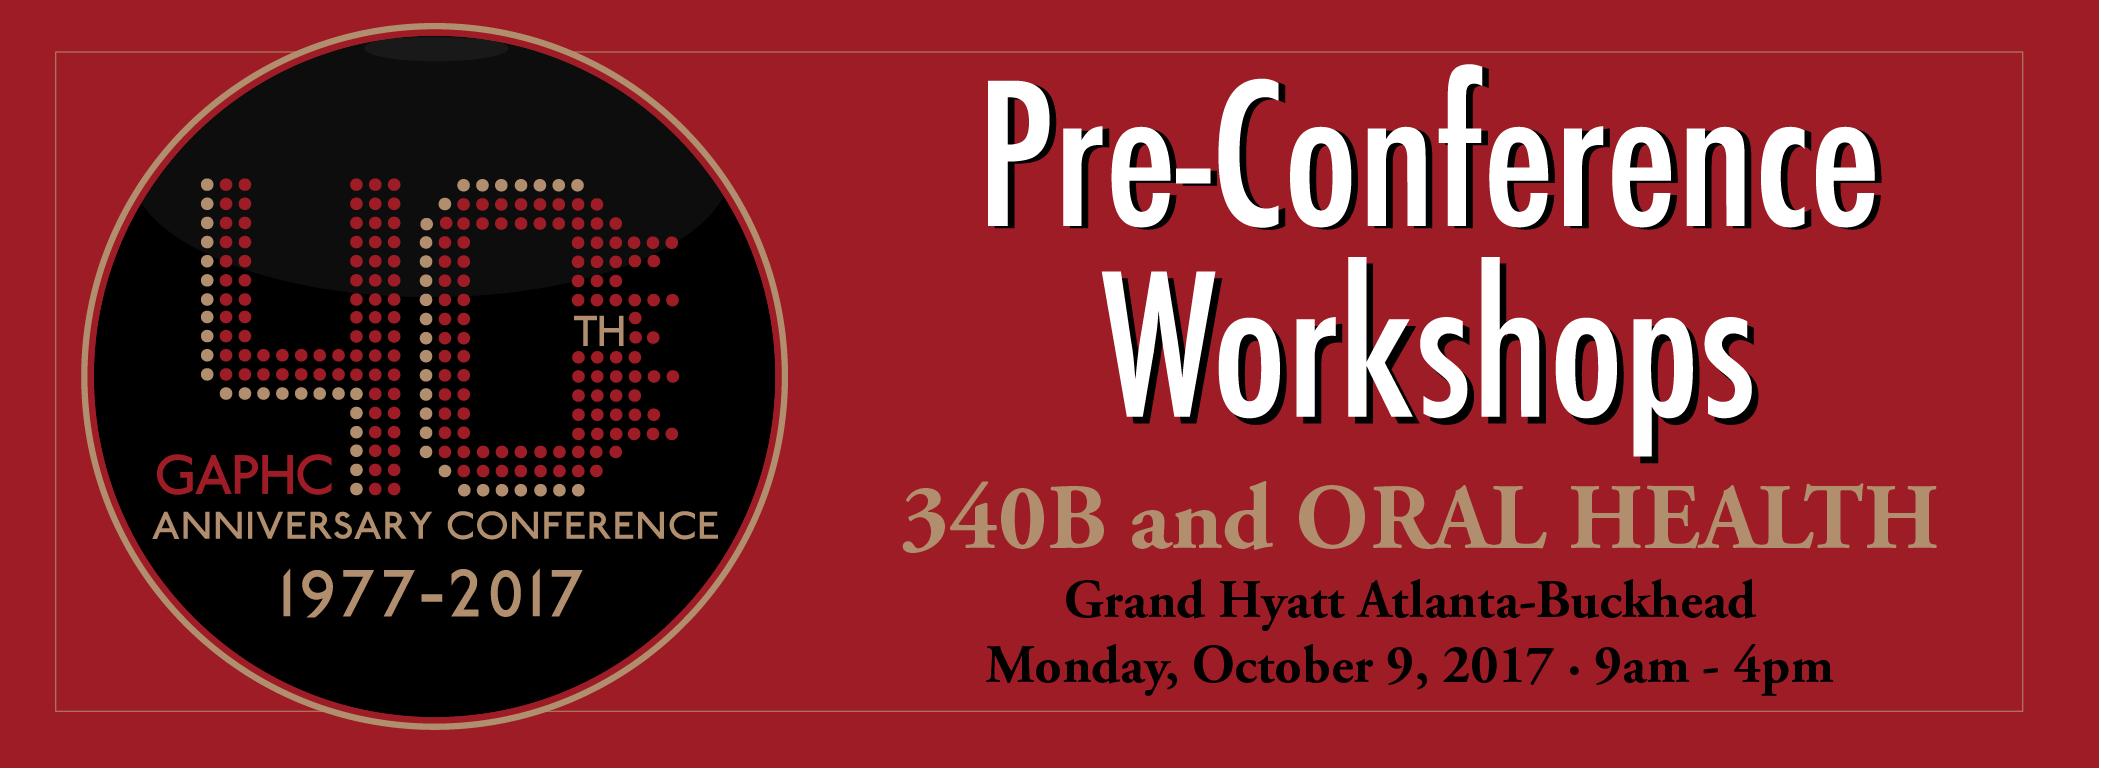 GAPHC's Pre-Conference Oral Health  & 340B Workshop